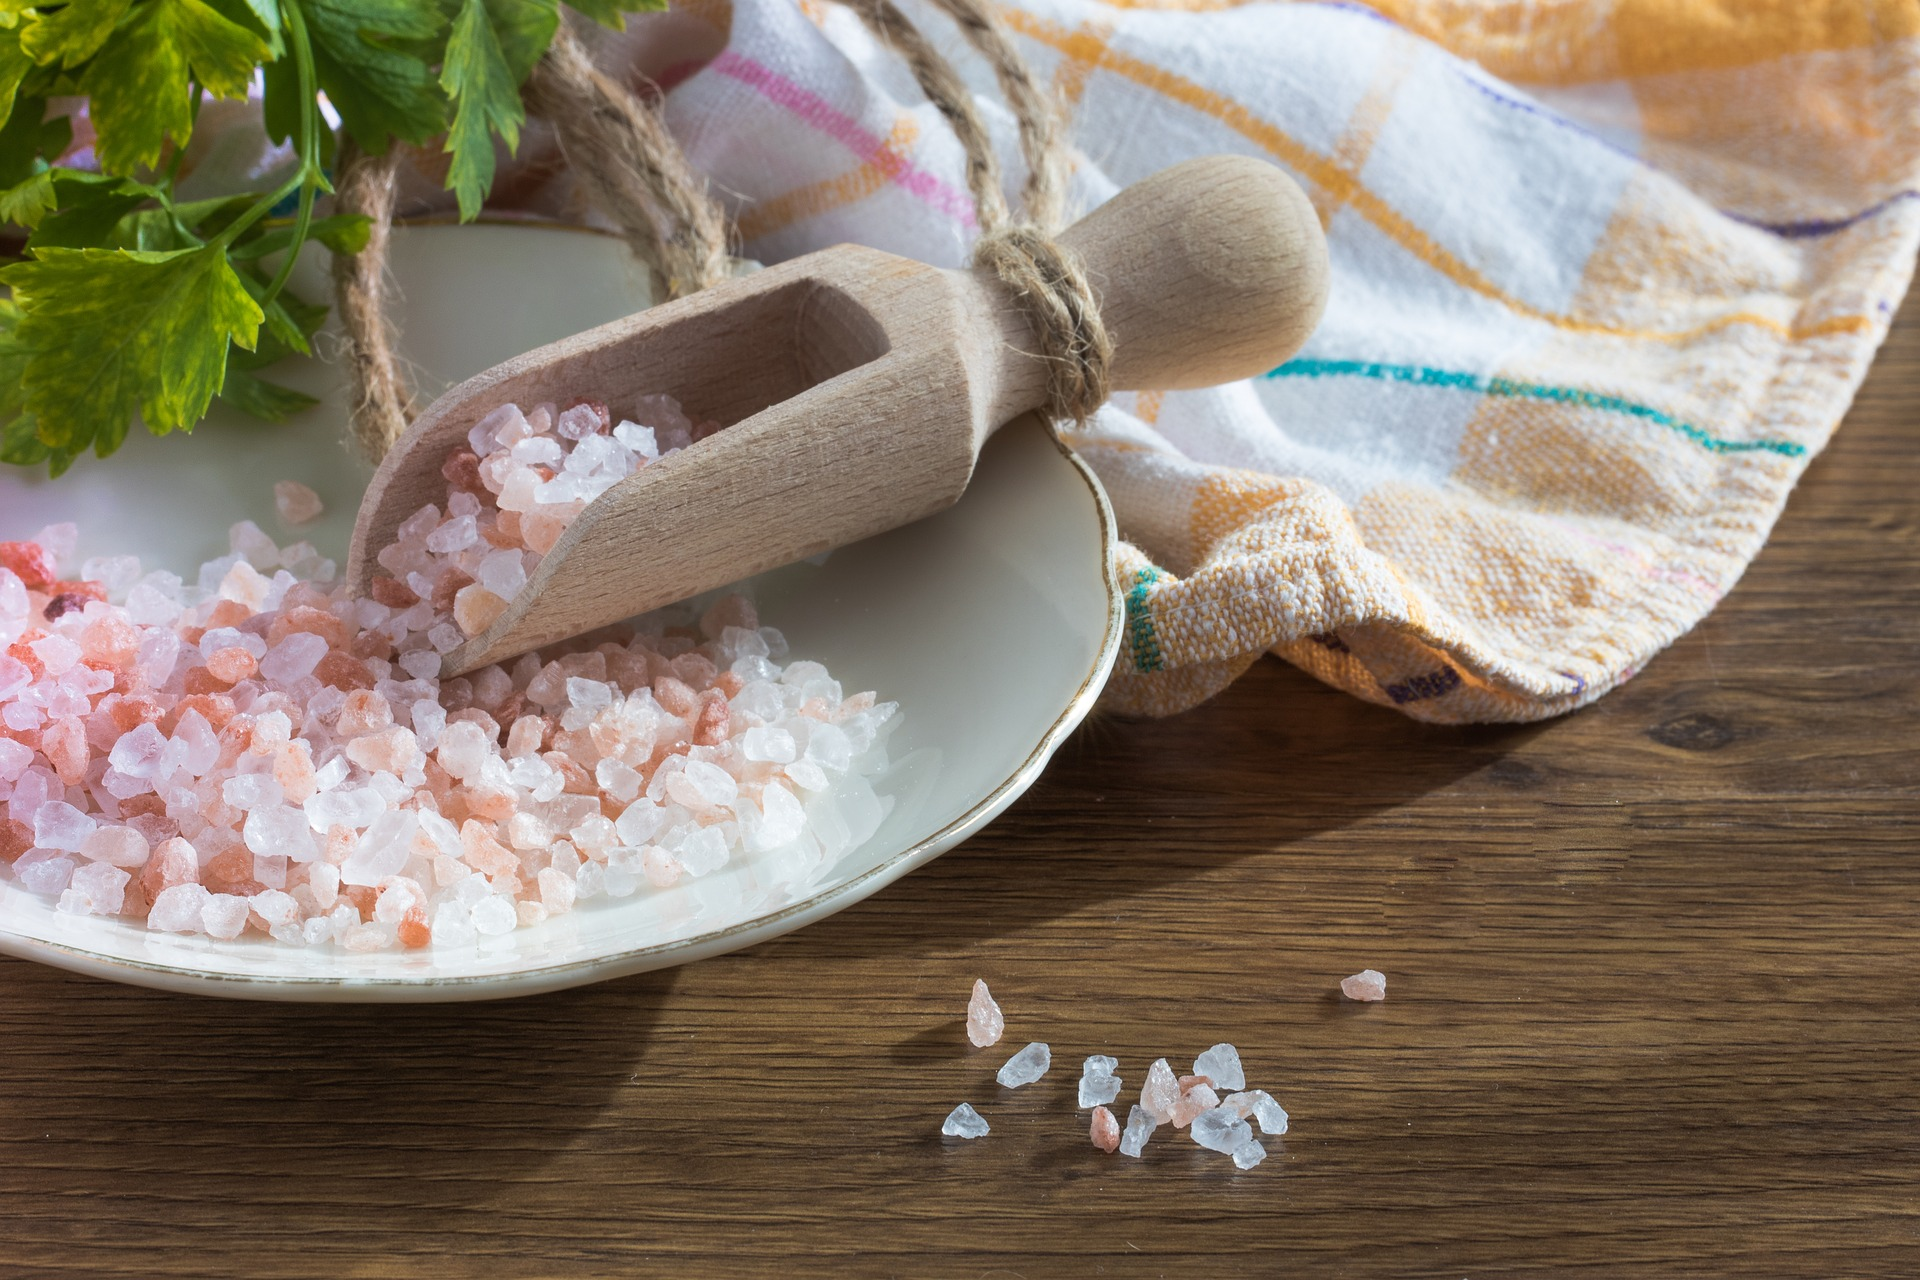 Čisto brez soli ne bo šlo